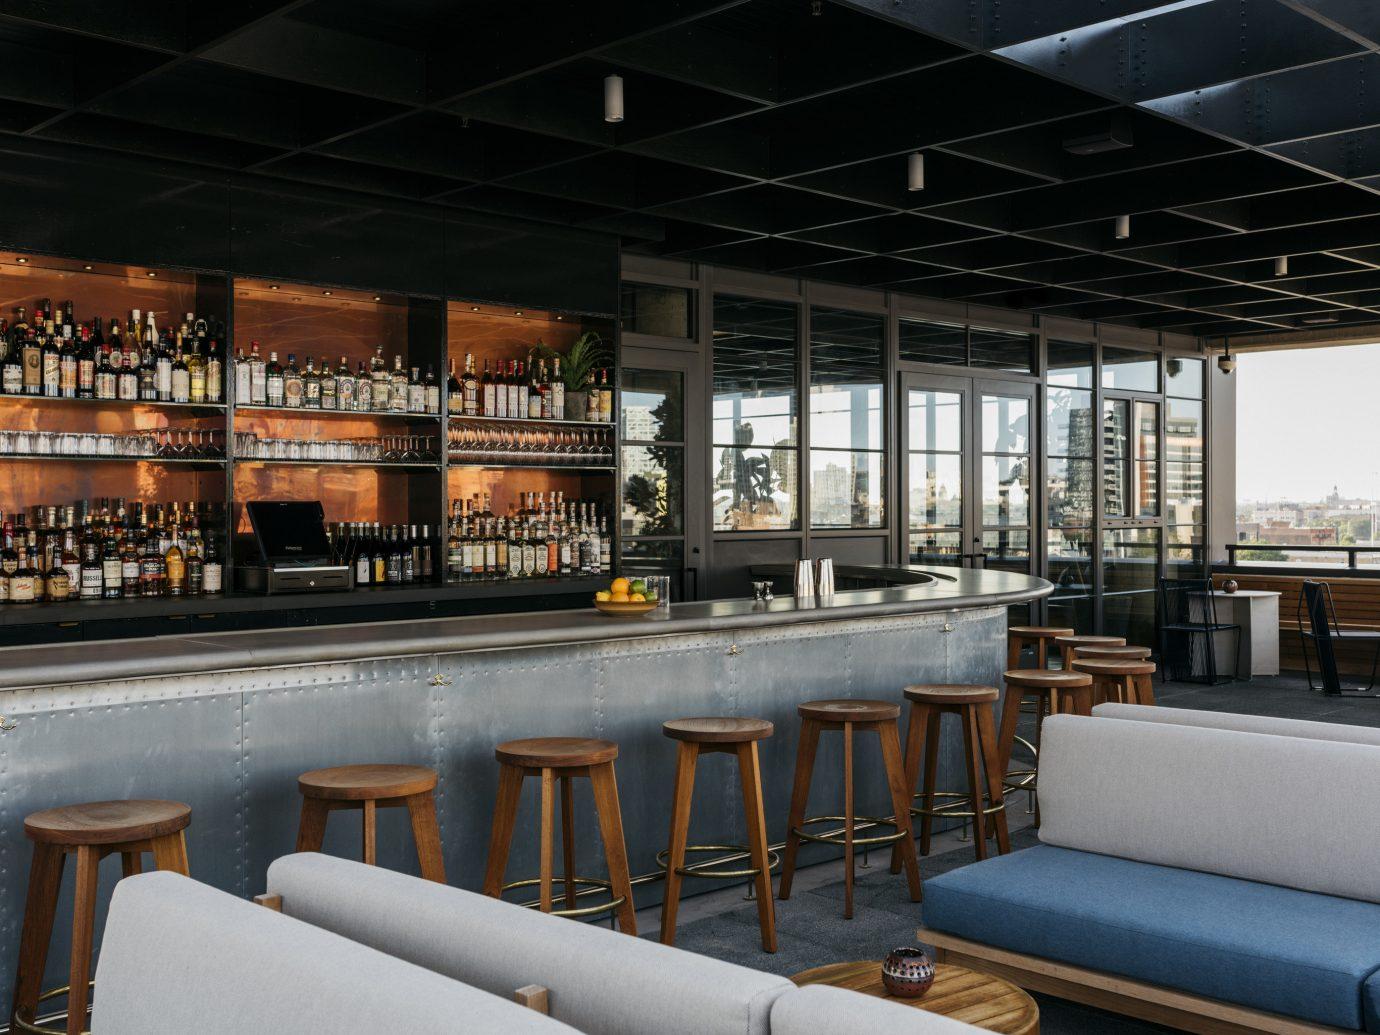 Food + Drink indoor ceiling interior design restaurant Bar